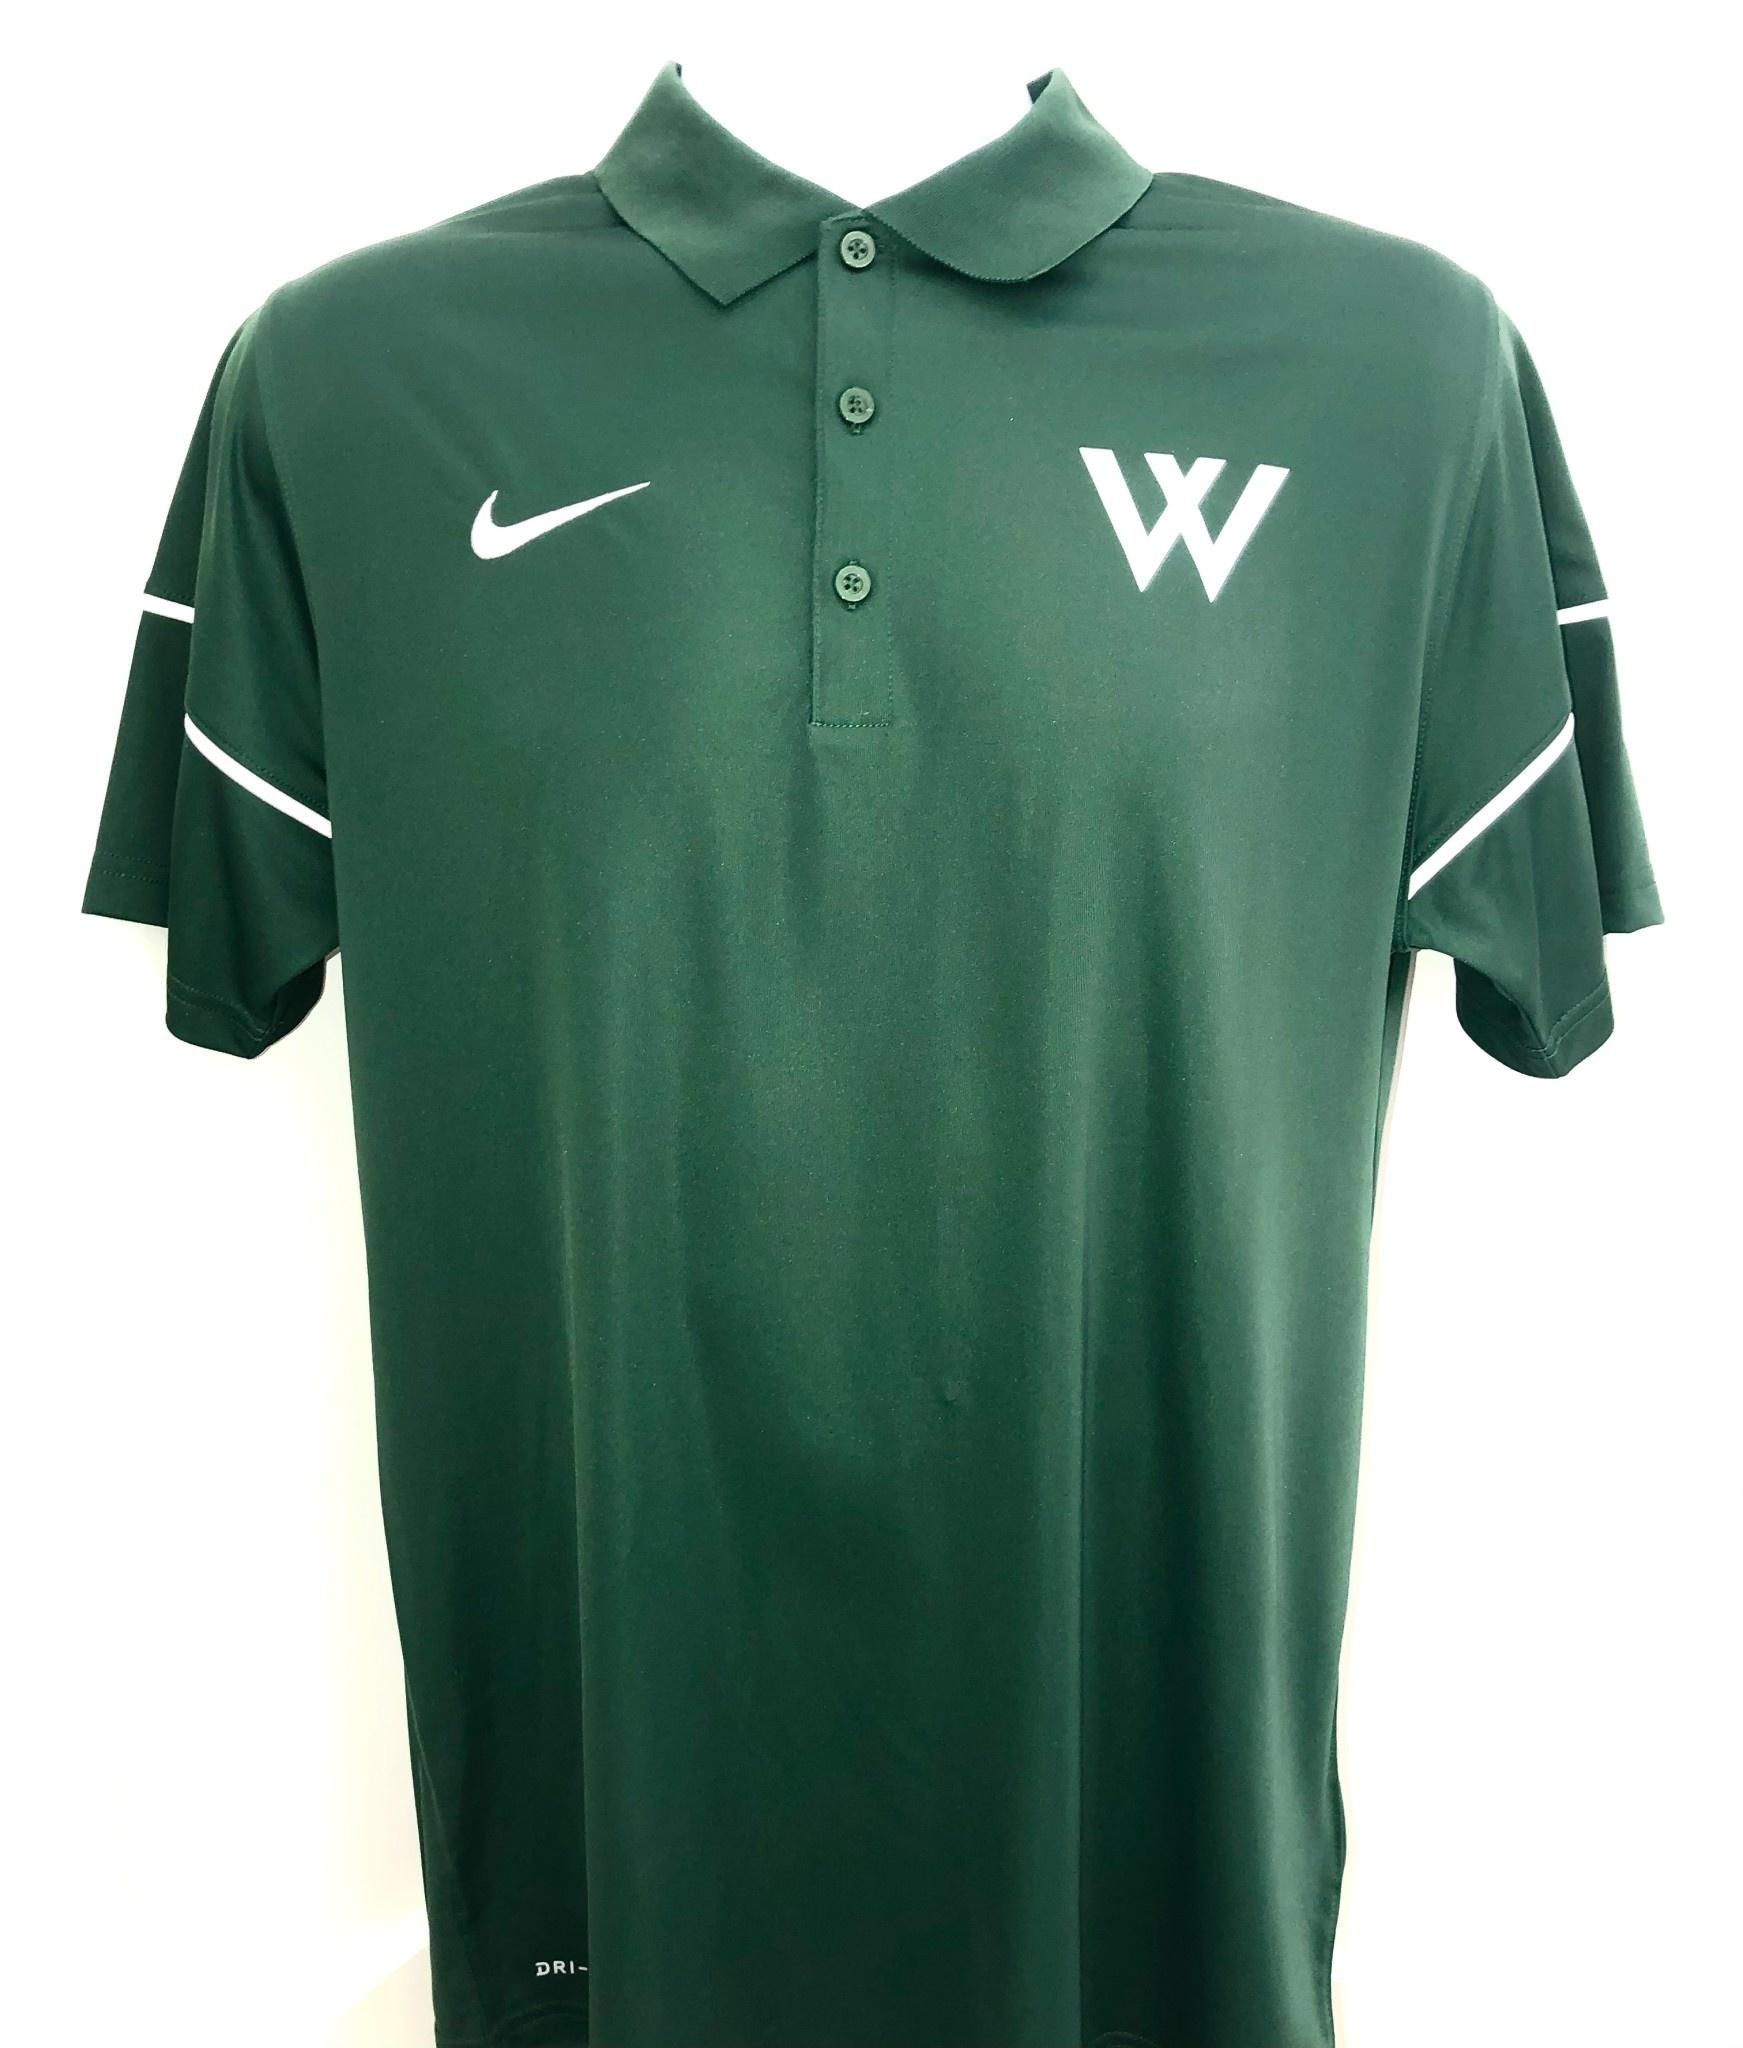 Nike Polo: Nike Team Issue Green w/W - Size Medium Only